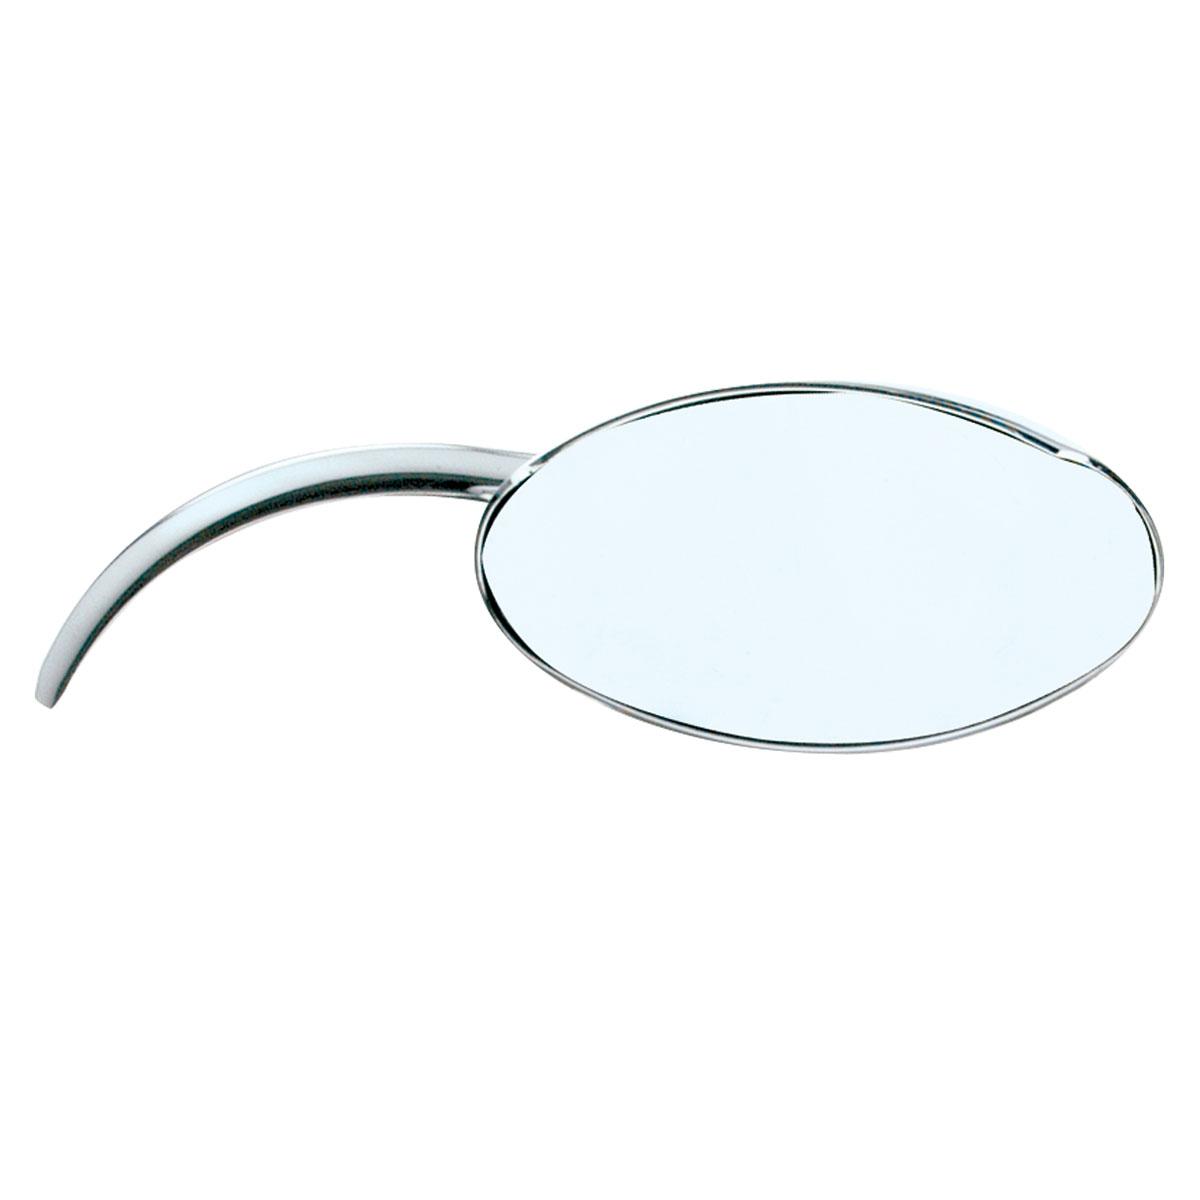 J&P Cycles Chrome Oval Mirror Set with Classic Contour Stem